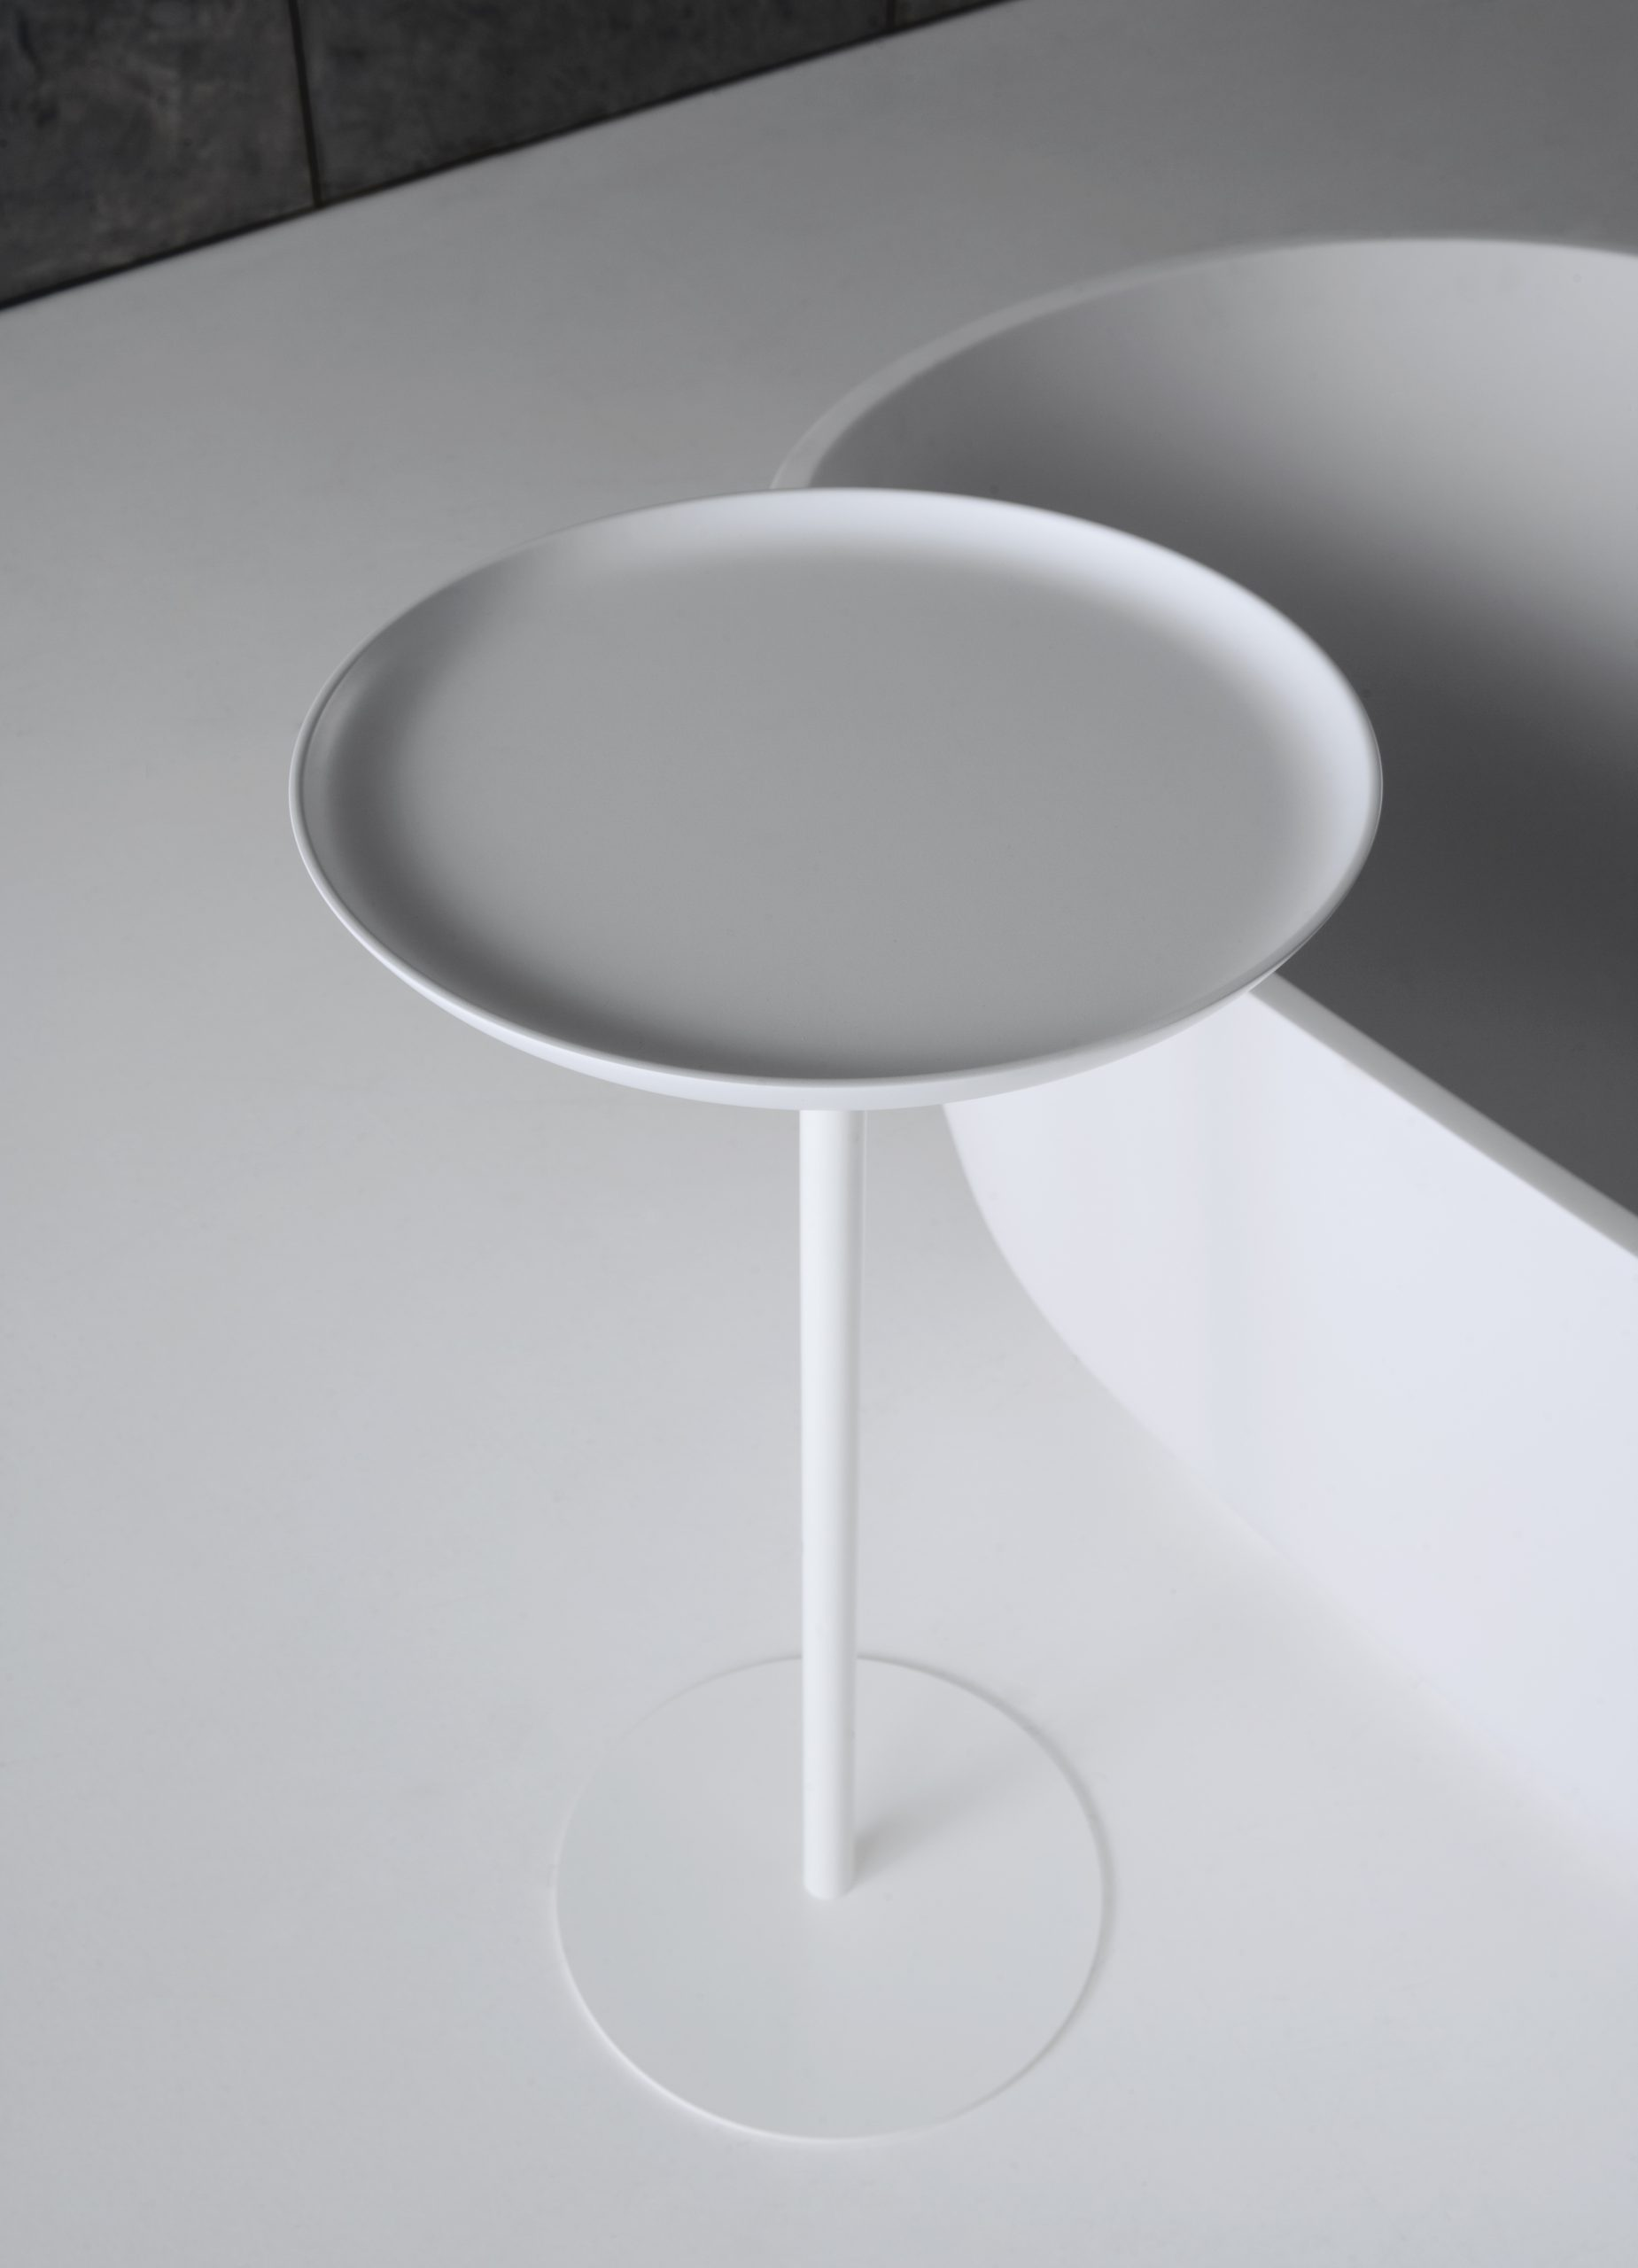 Lino side table by Debiasi Sandri for Antoniolupi